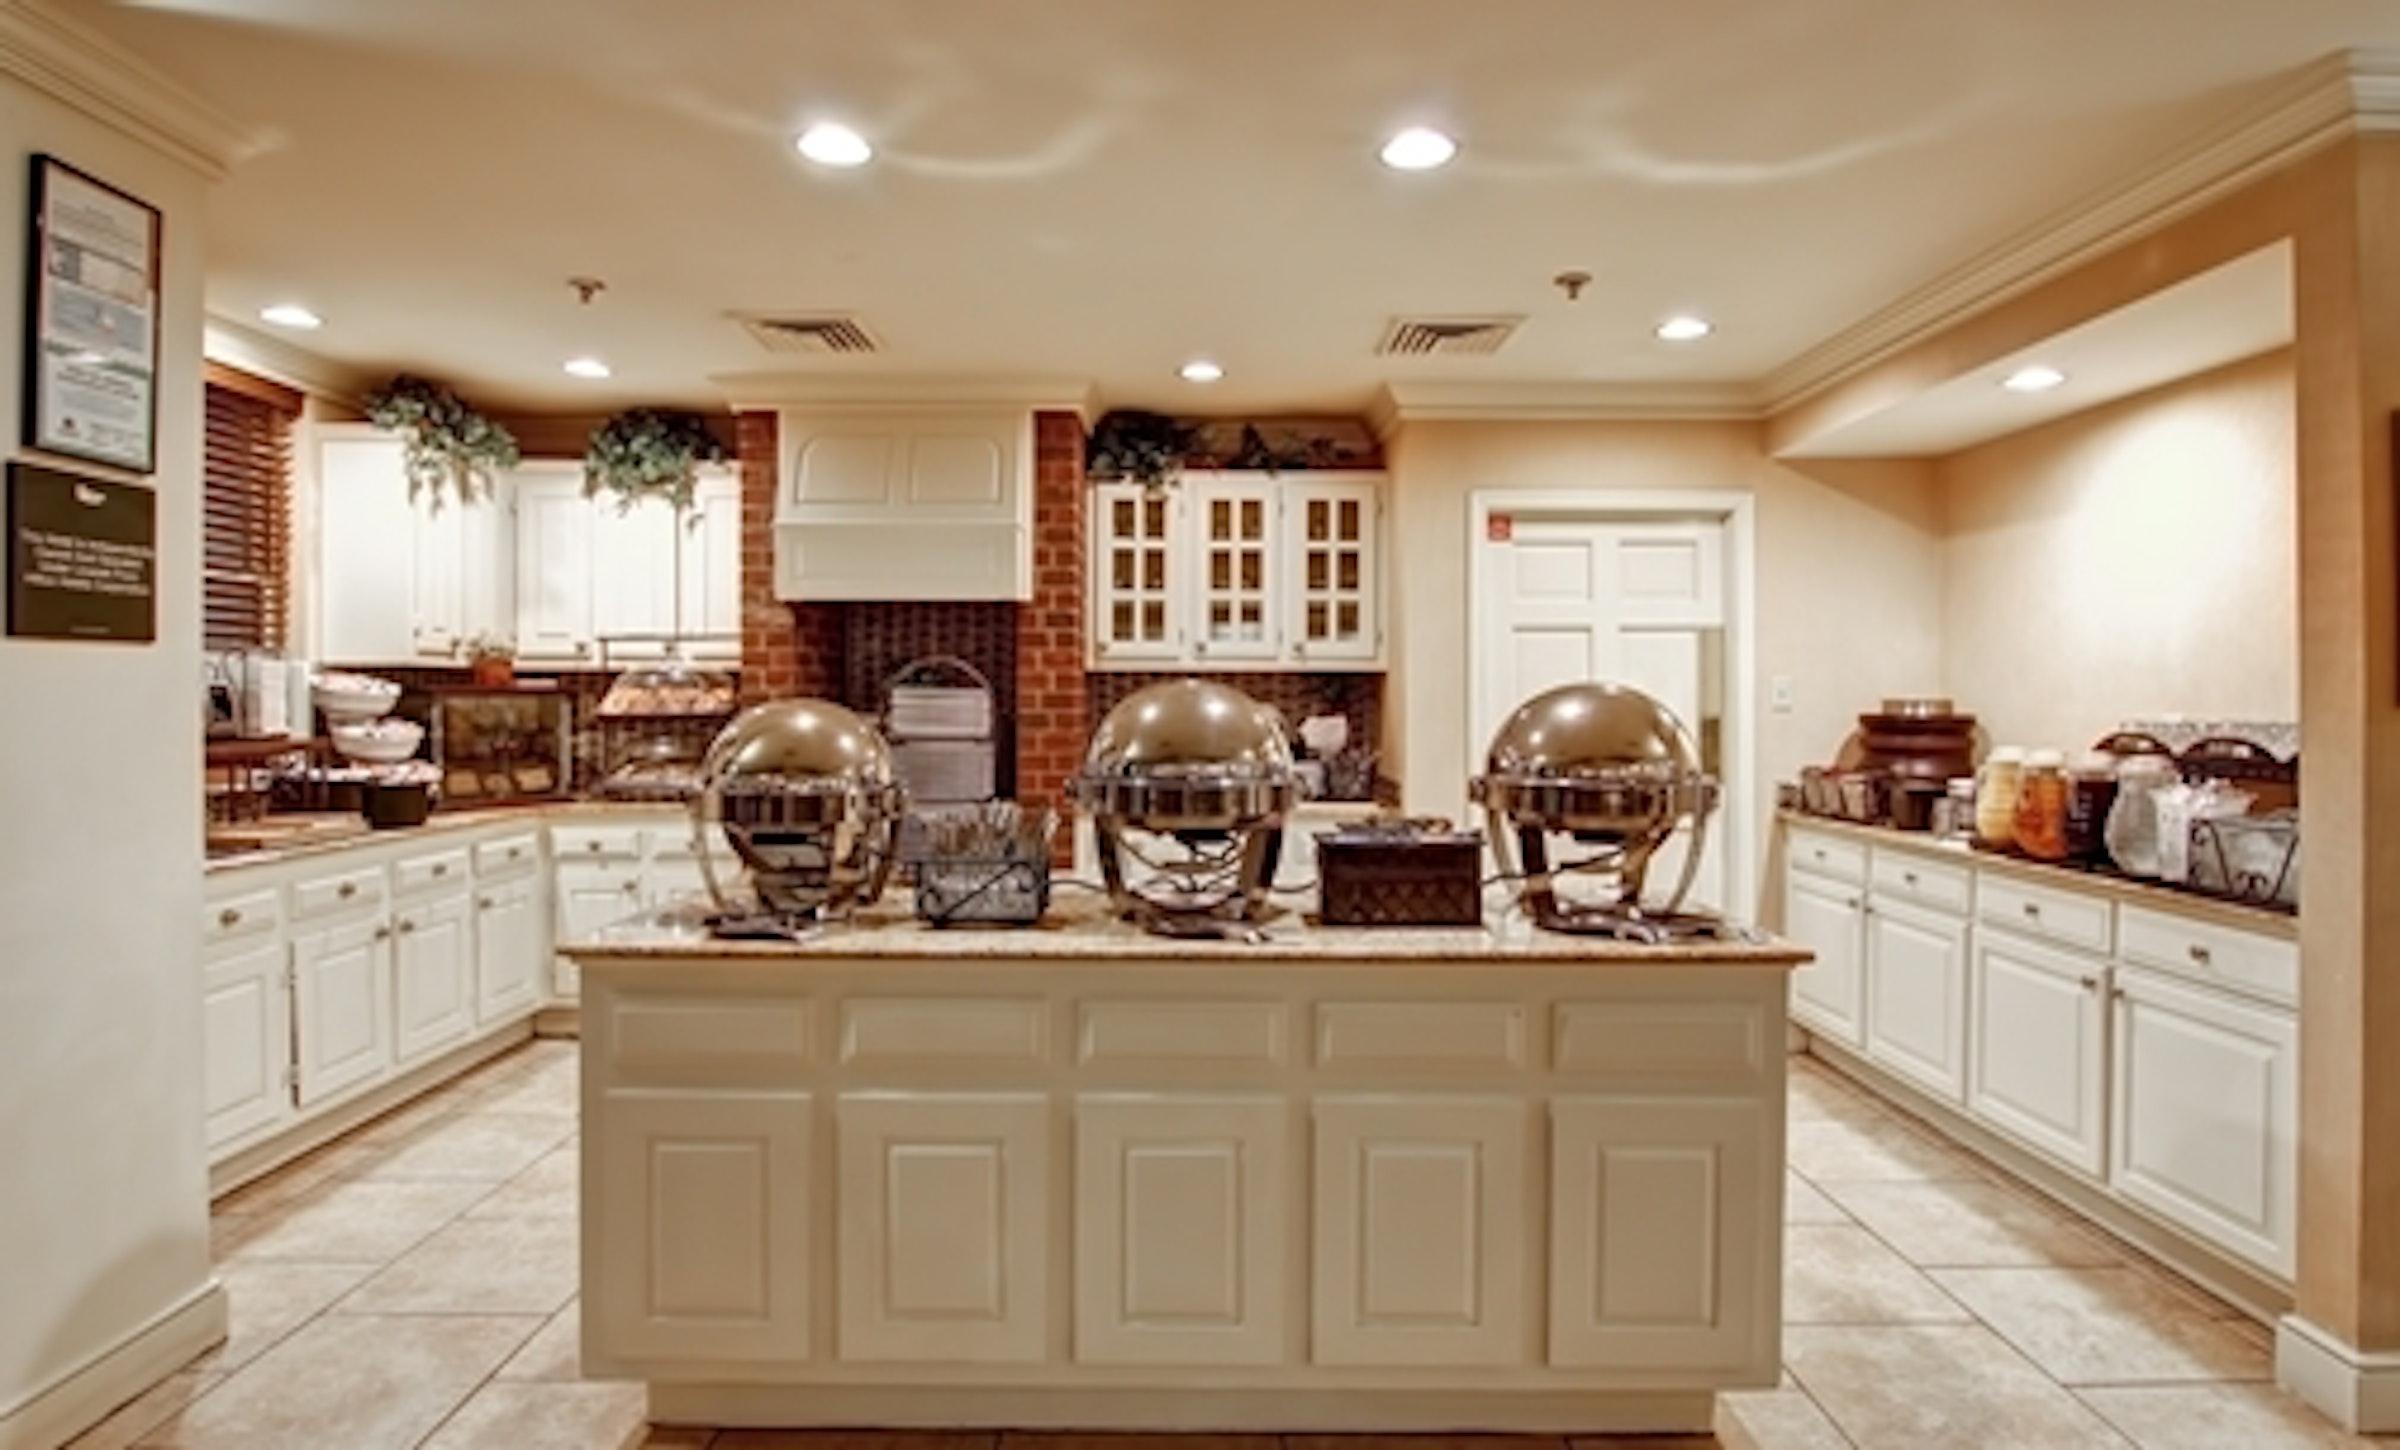 Homewood Suites by Hilton Dallas Addison in Beyond Dallas